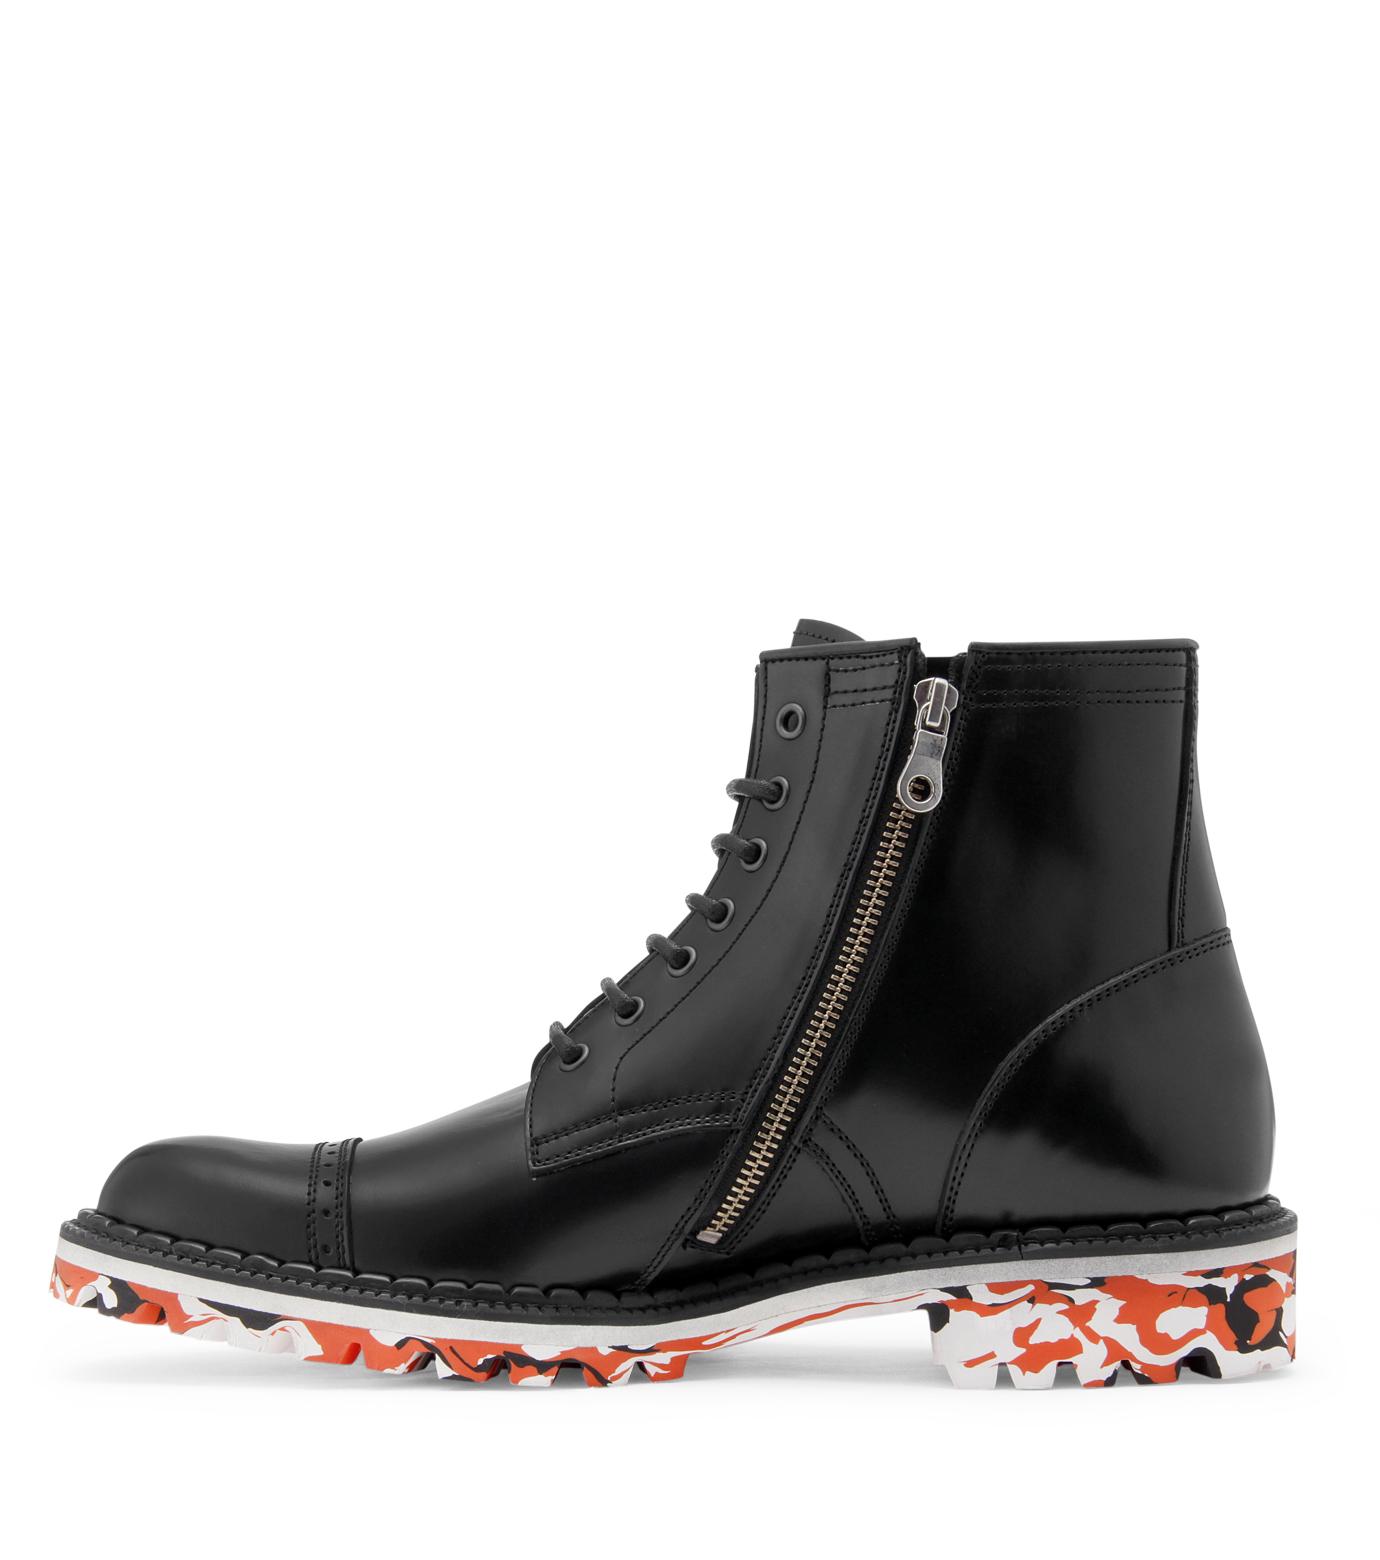 Miharayasuhiro(ミハラヤスヒロ)のMarble sole boots-BLACK-83230200-13 拡大詳細画像2